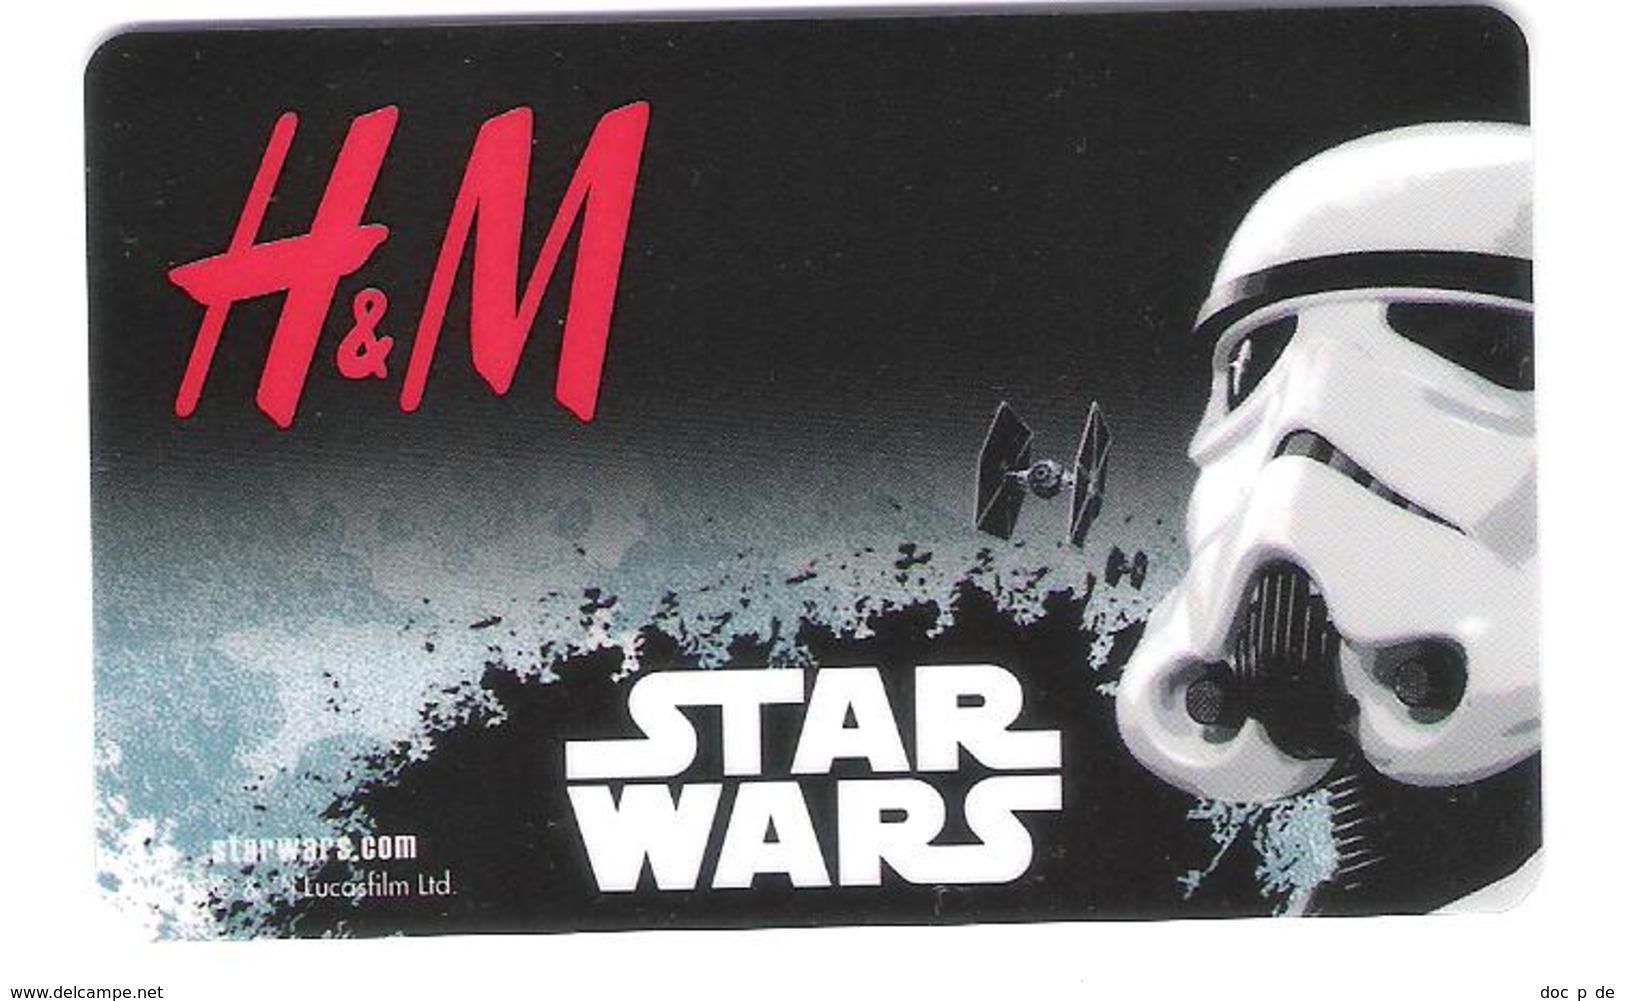 Germany - Allemagne - H&M - Star Wars - Carte Cadeau - Carta Regalo - Gift Card - Geschenkkarte - Gift Cards